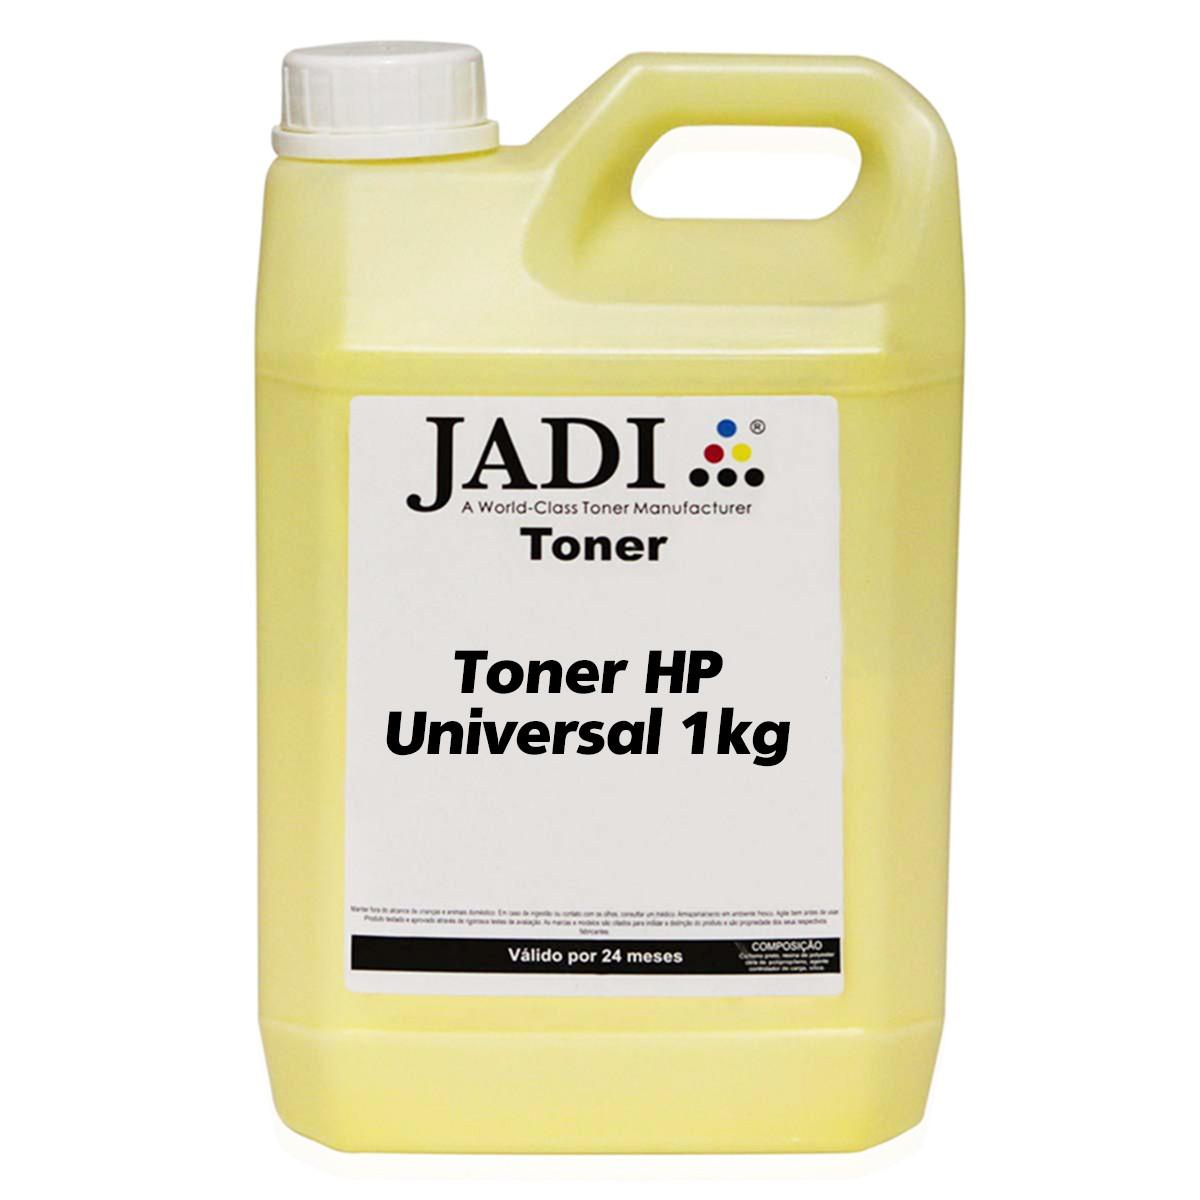 Toner Refil HP CF382A 312A 82A Amarelo | M476 M476NW M476DW | Jadi 1kg